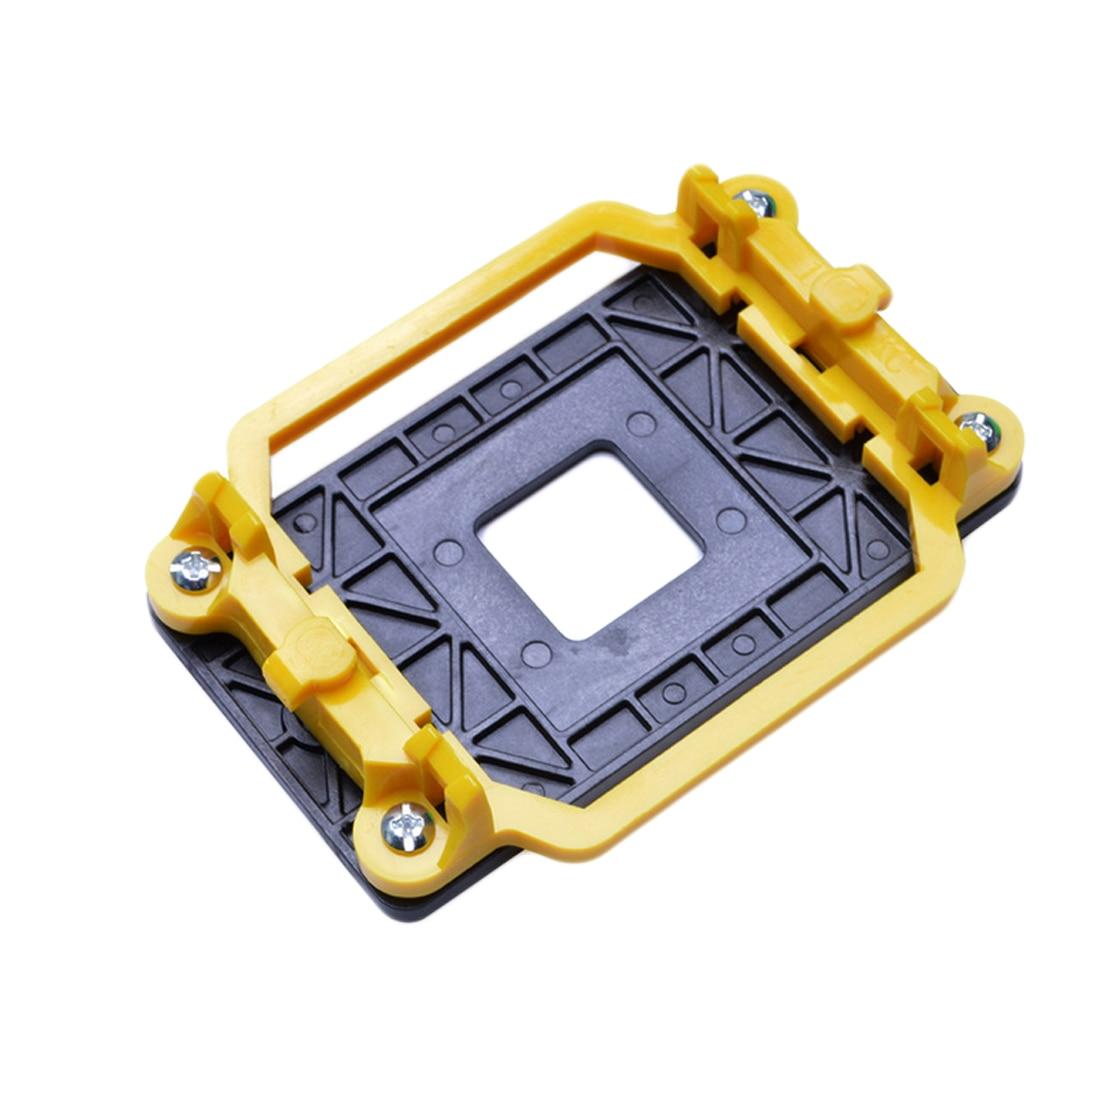 Etmakit Good Sale CPU Cooler Bracket Motherboard for AMD AM2/AM2+/AM3/AM3+/FM1/FM2/FM2+/940/939 Install the fastening